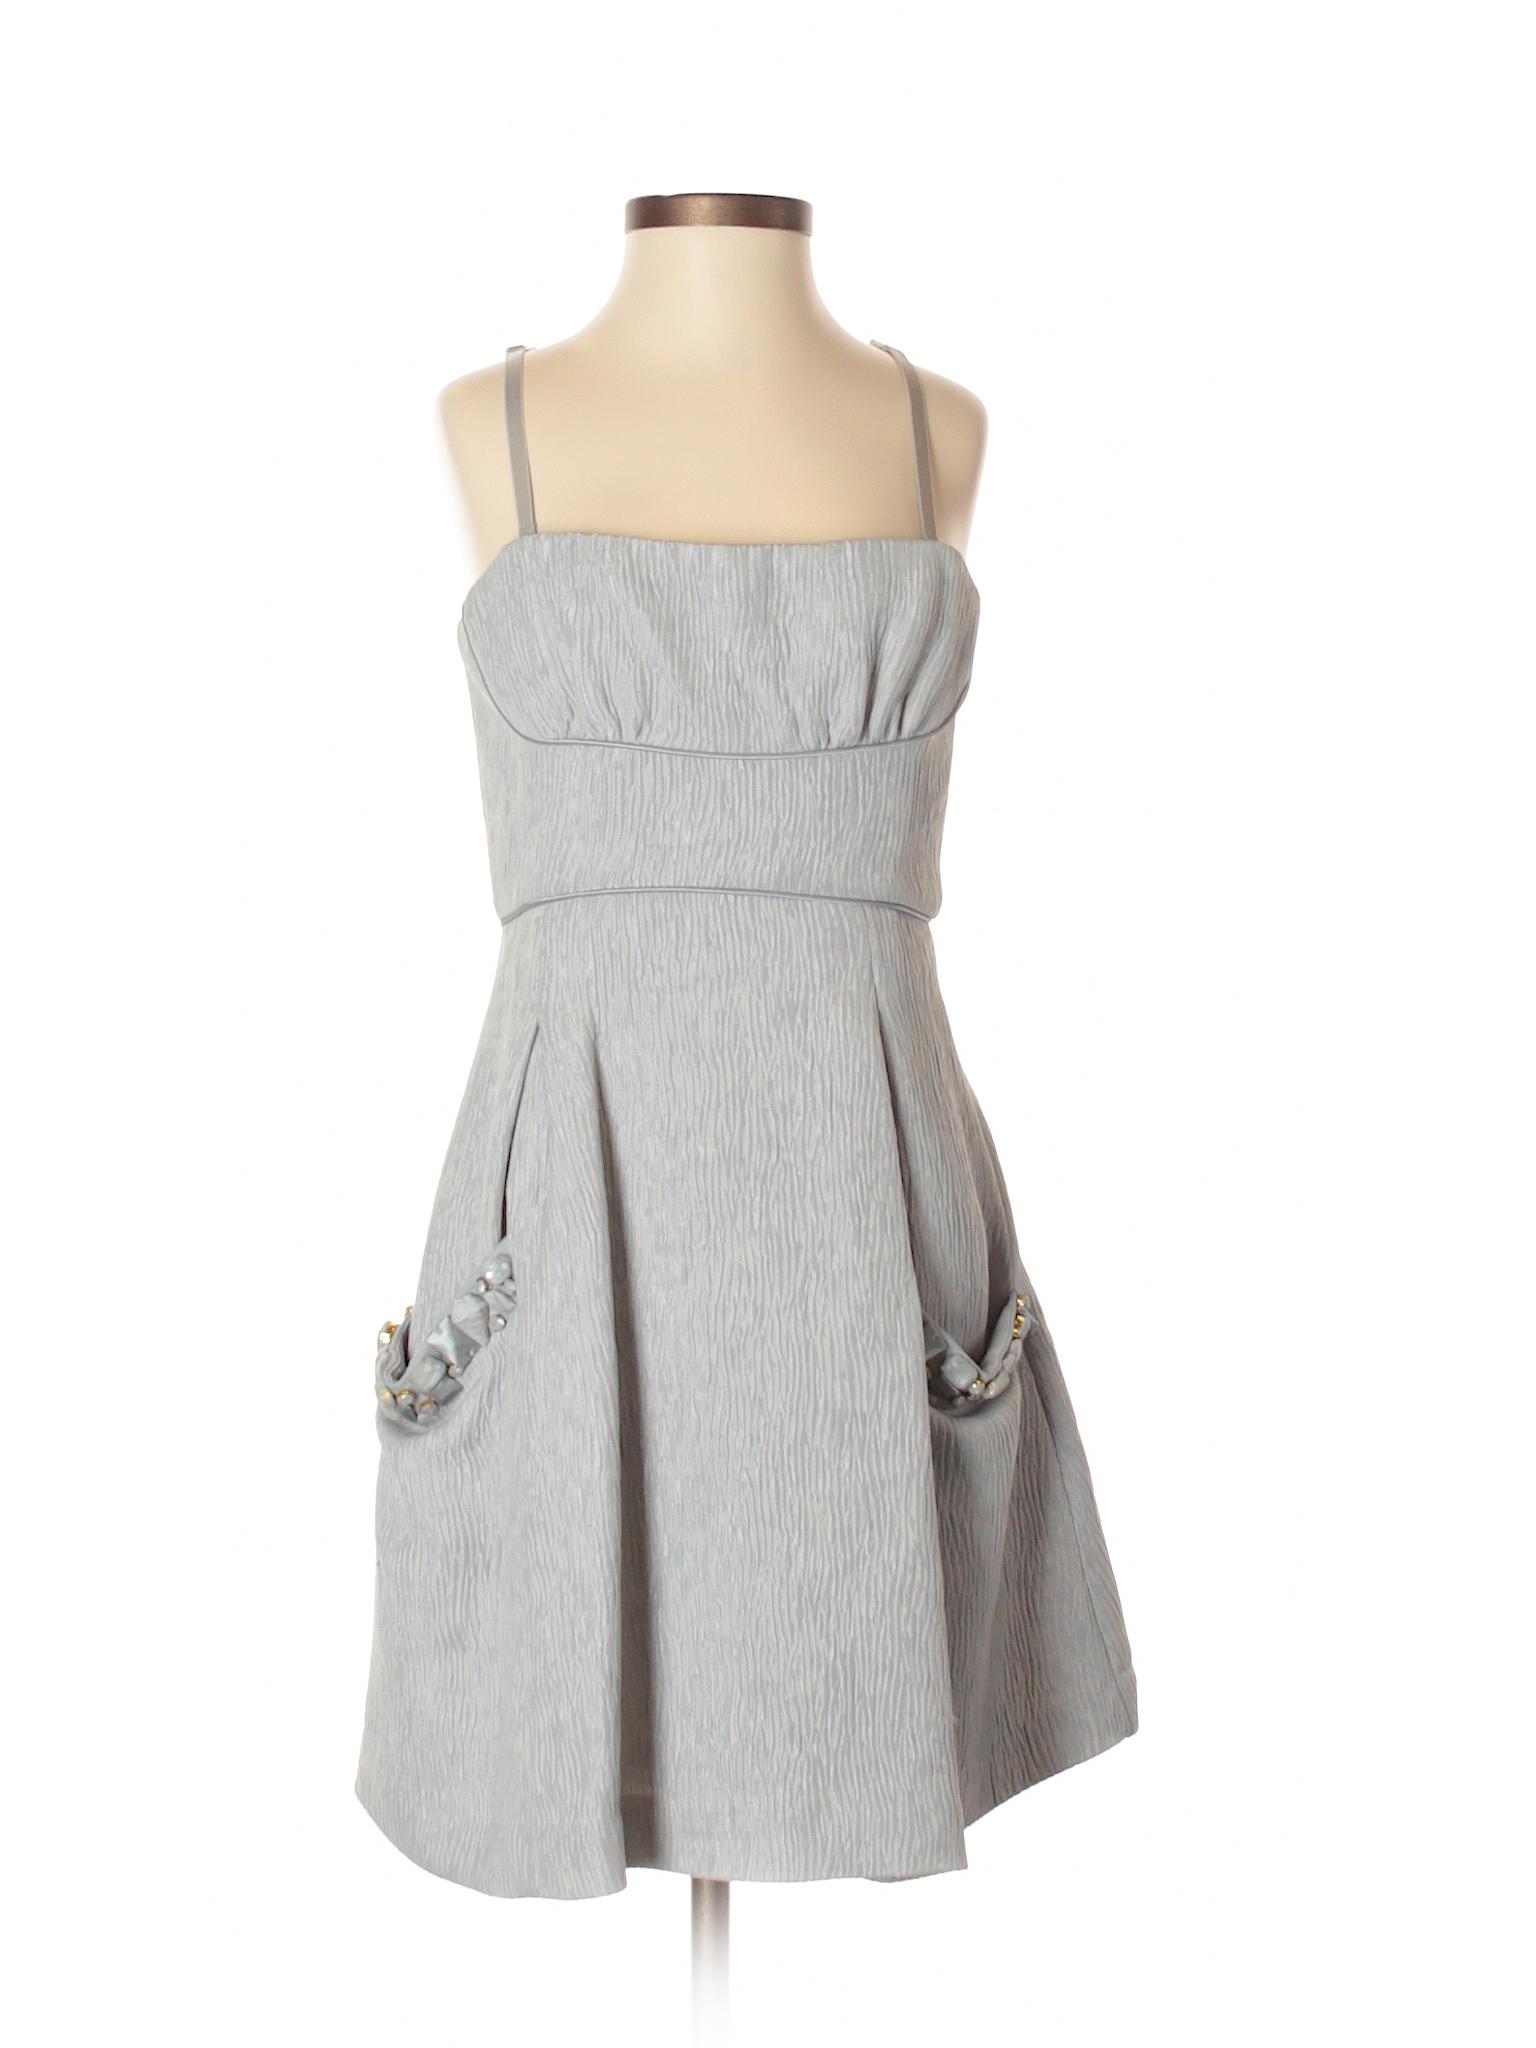 BCBGMAXAZRIA Solid Gray Cocktail Dress Size 2 - 75% off | thredUP